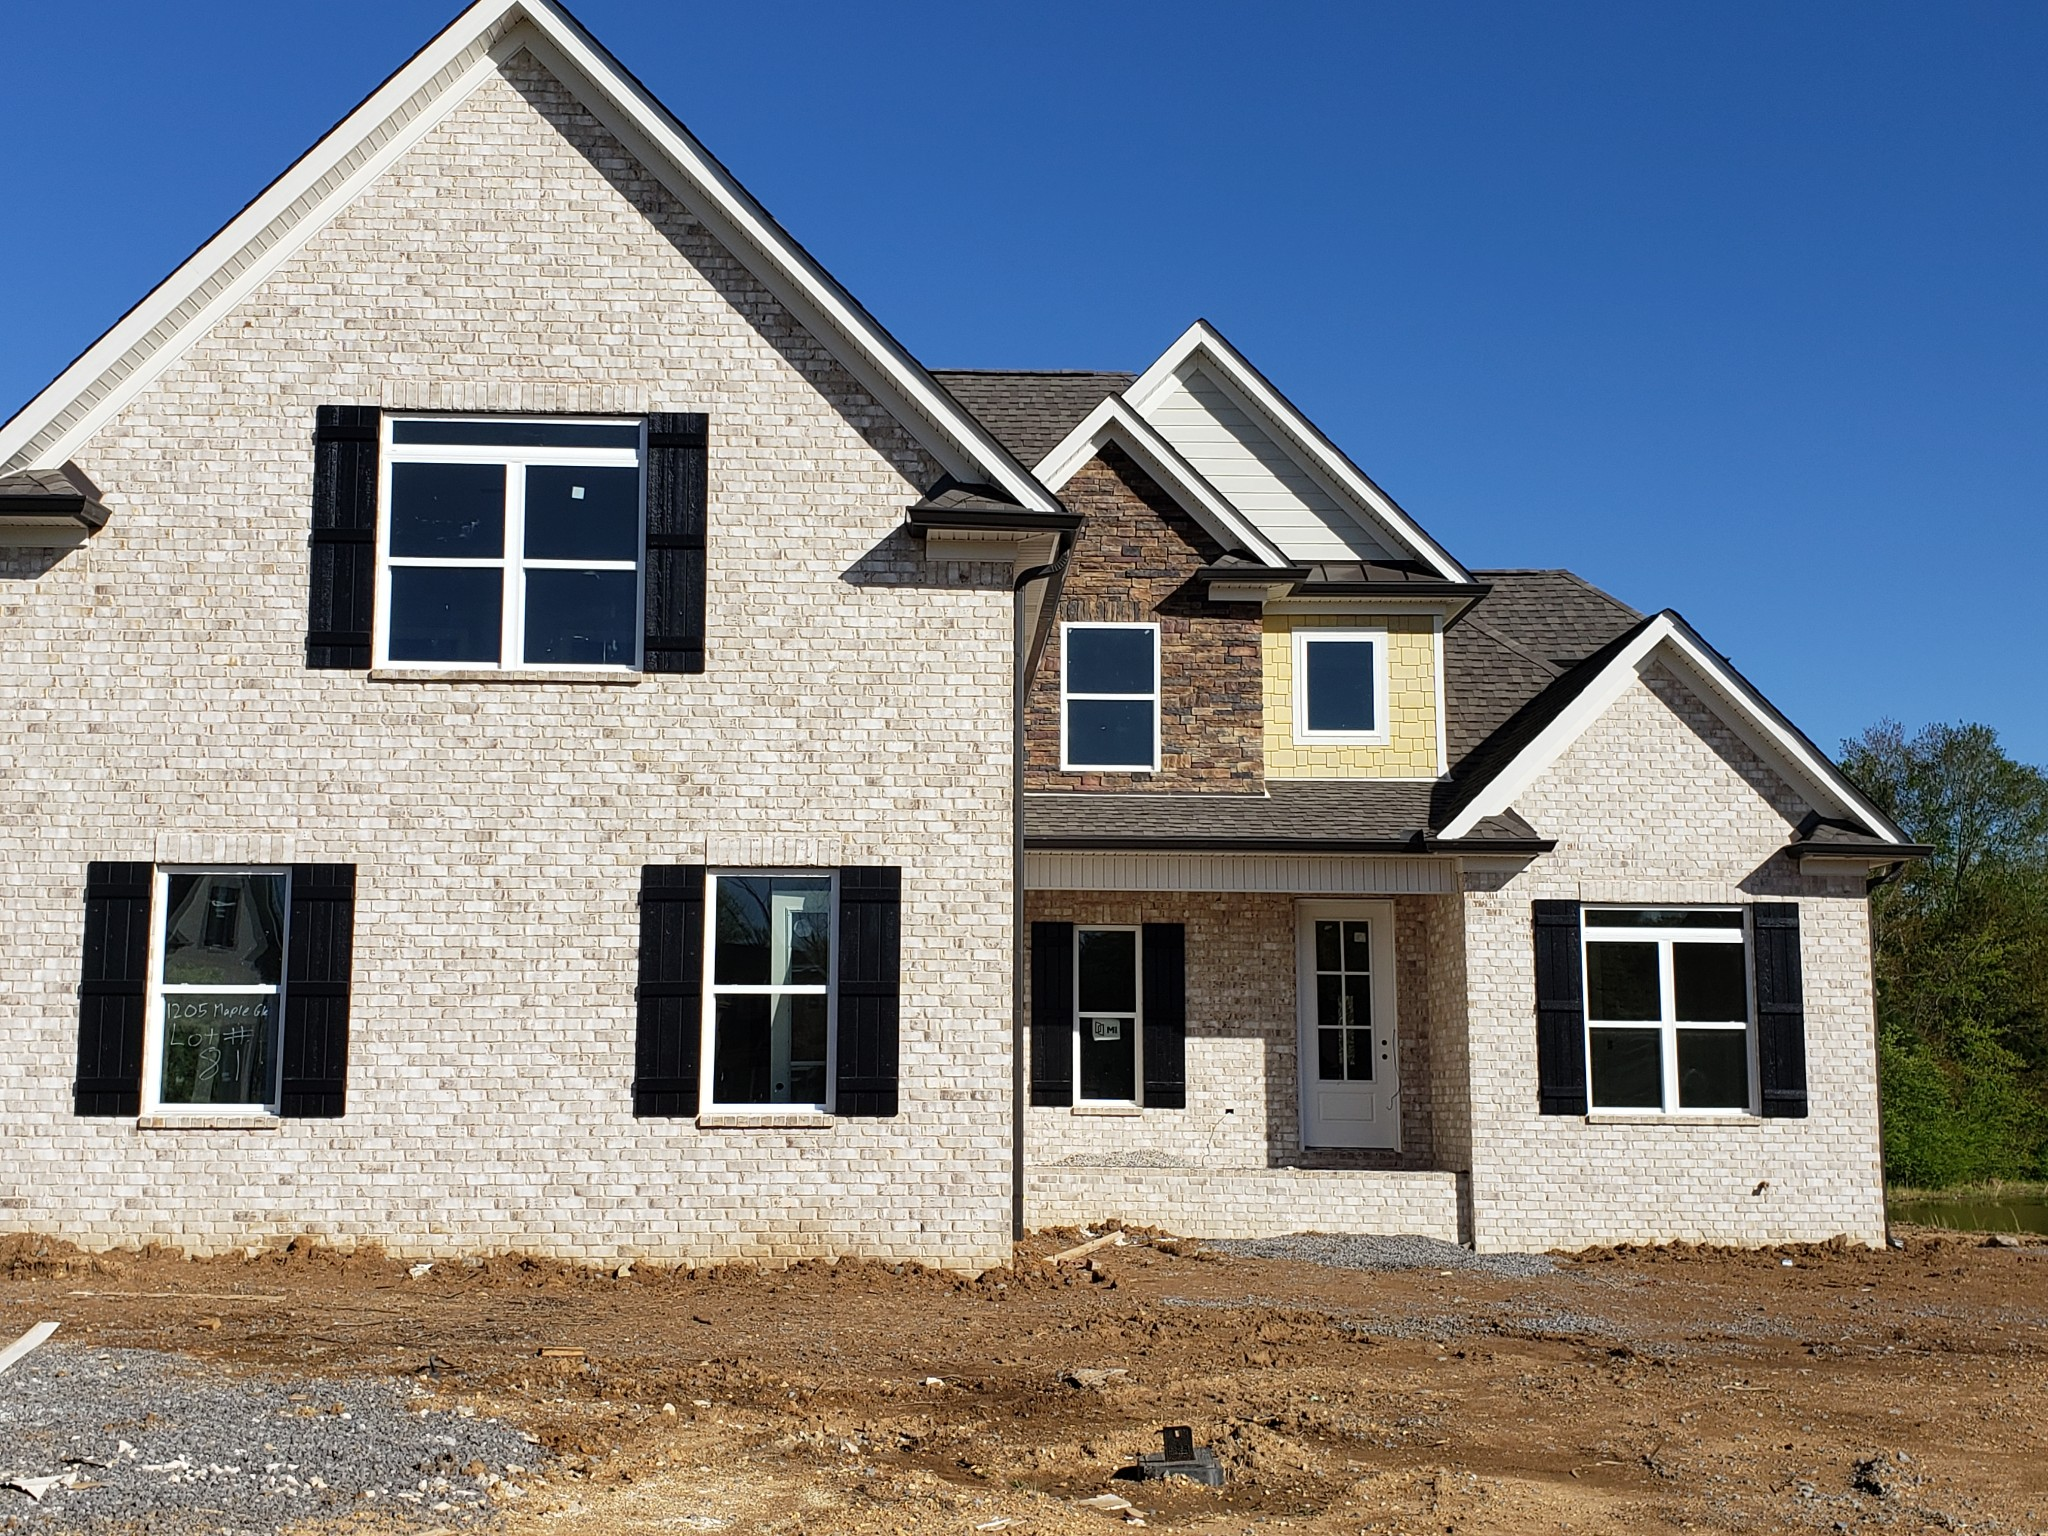 1202 Maple Glen, Lebanon, TN 37087 - Lebanon, TN real estate listing